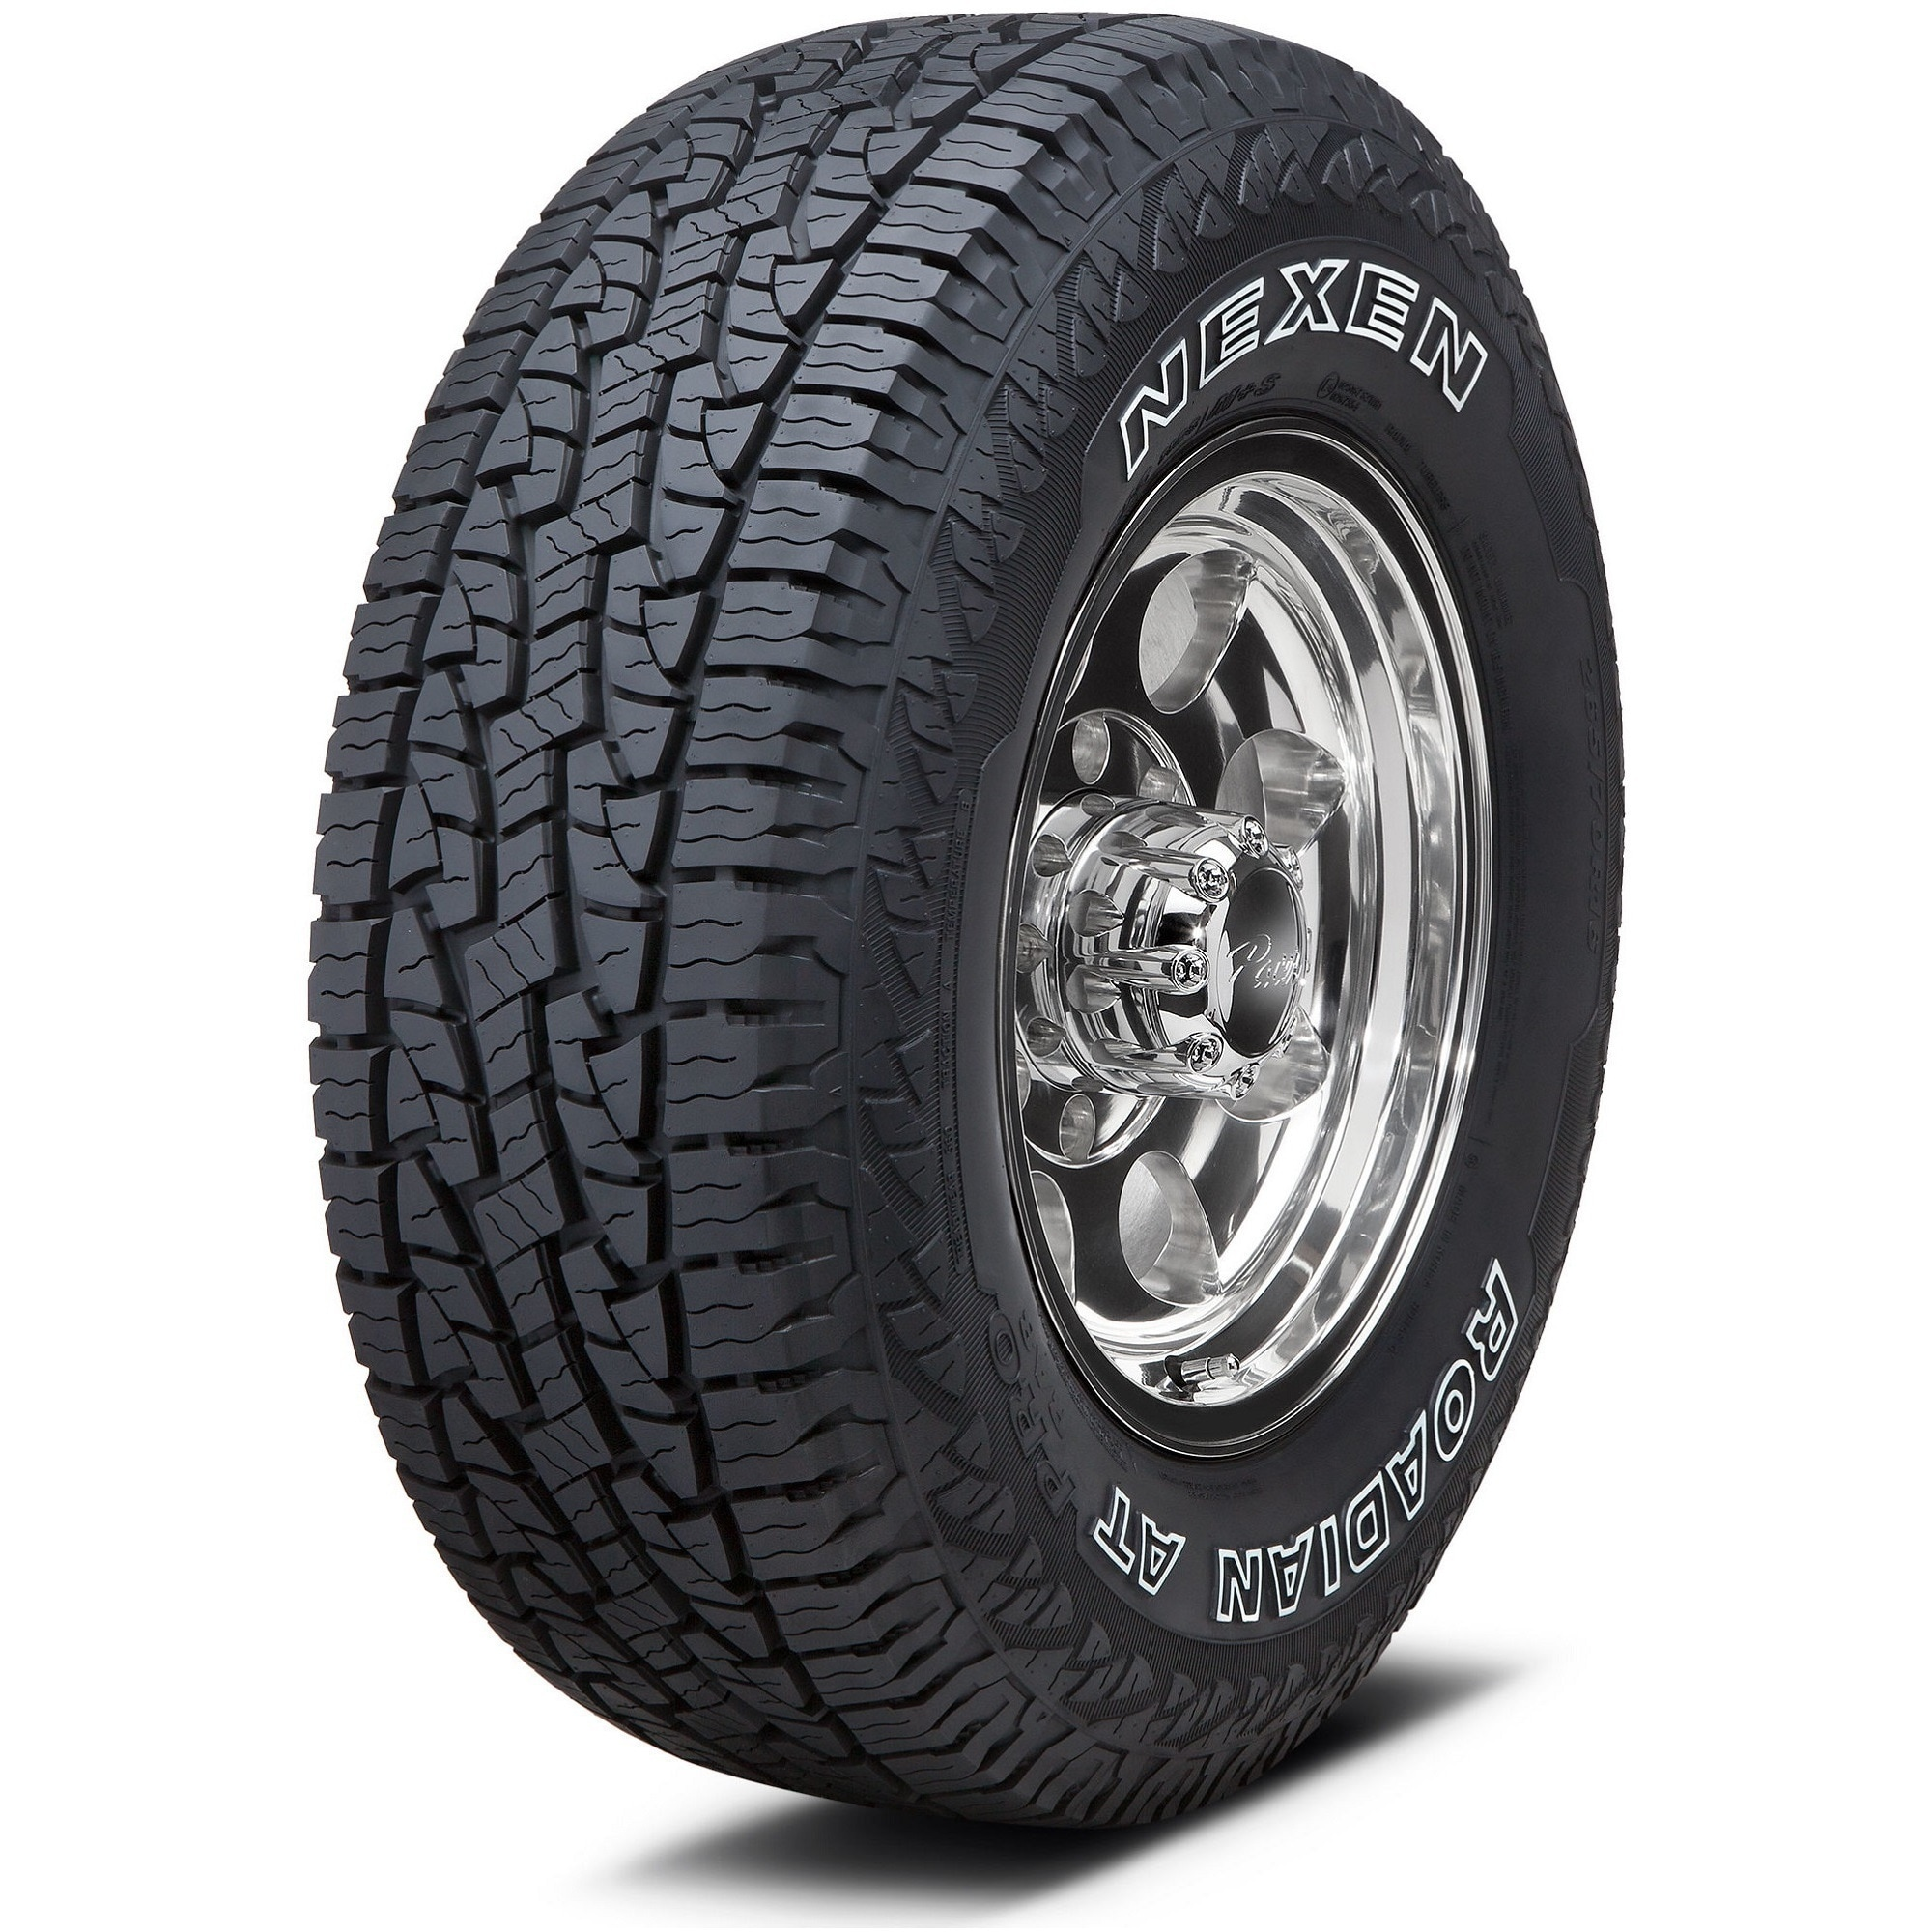 Nexen Roadian AT Pro RA8 All Terrain Tire - LT235/75R15 L...